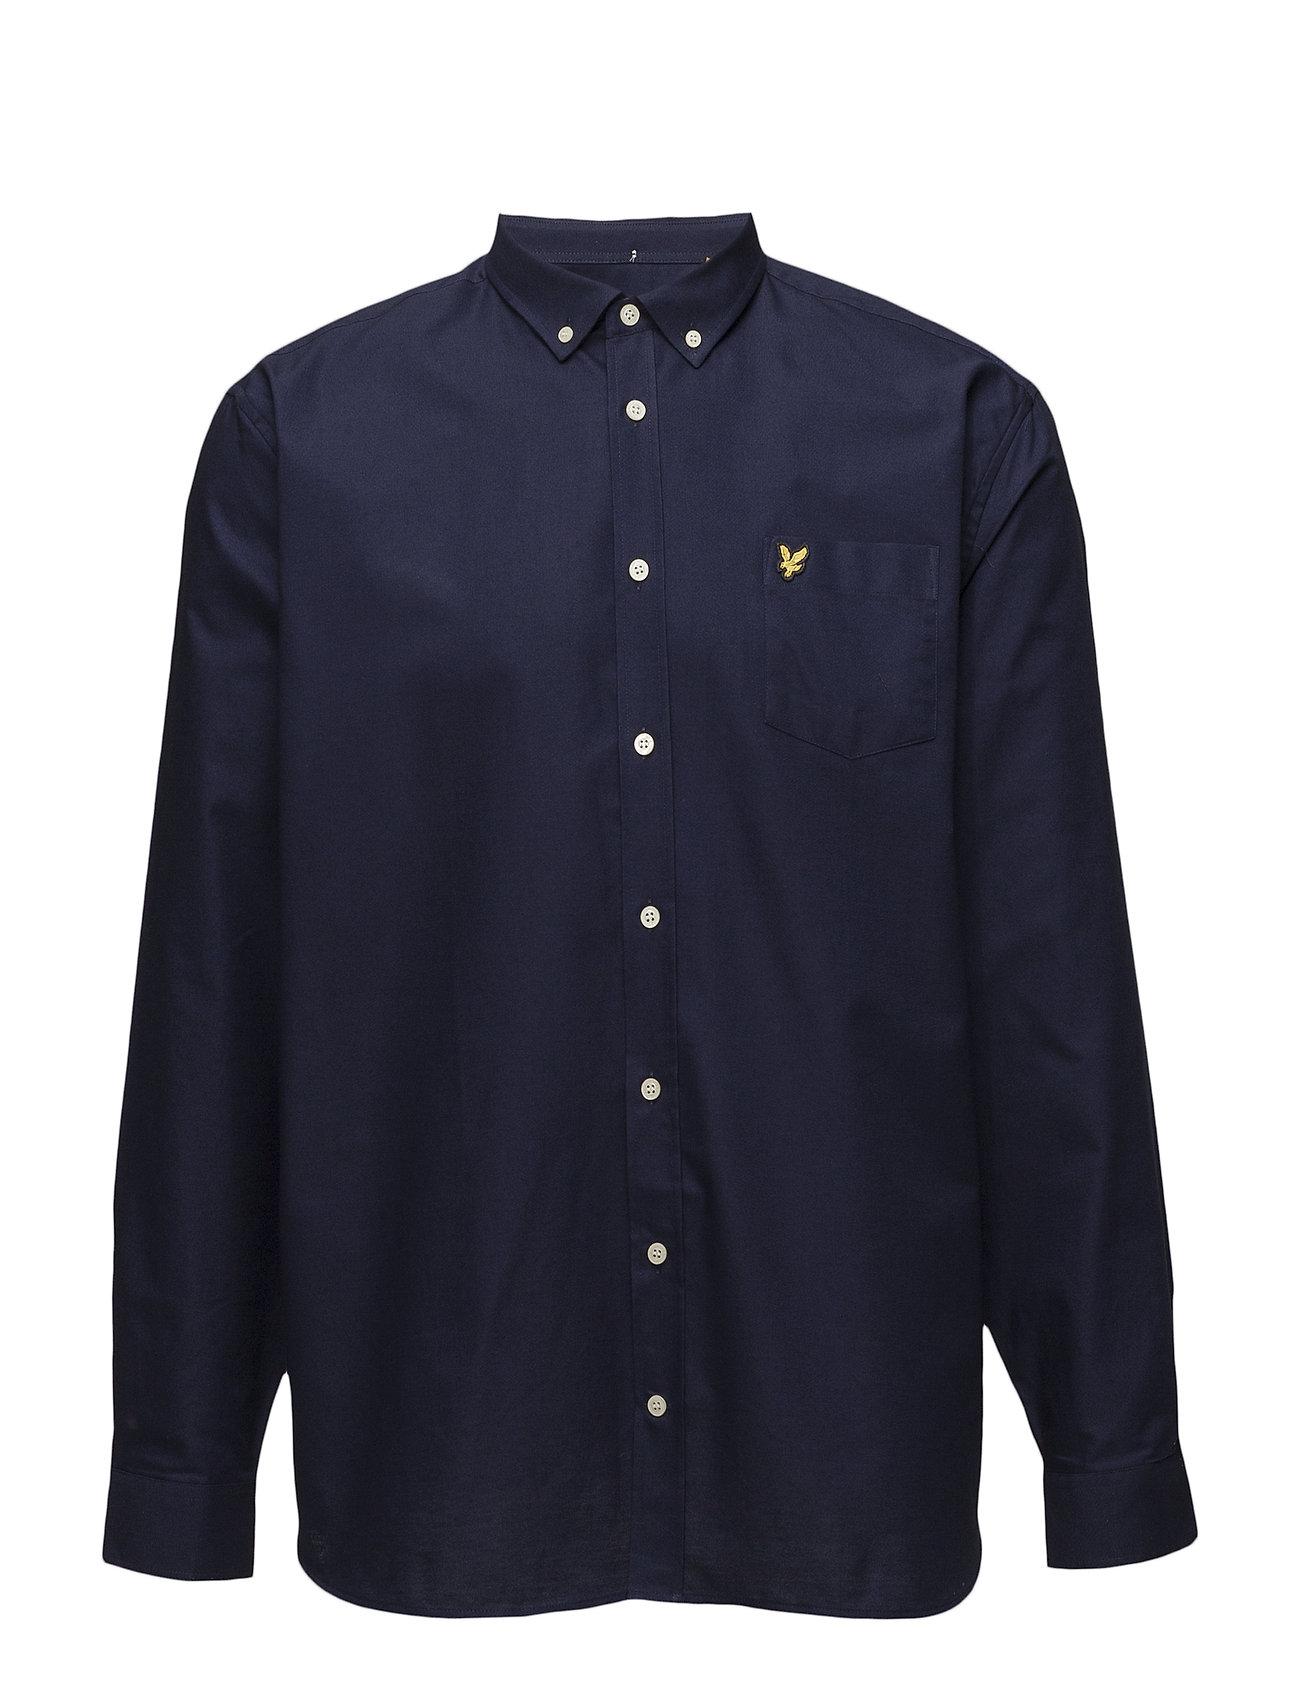 Lyle & Scott Oxford Shirt - NAVY